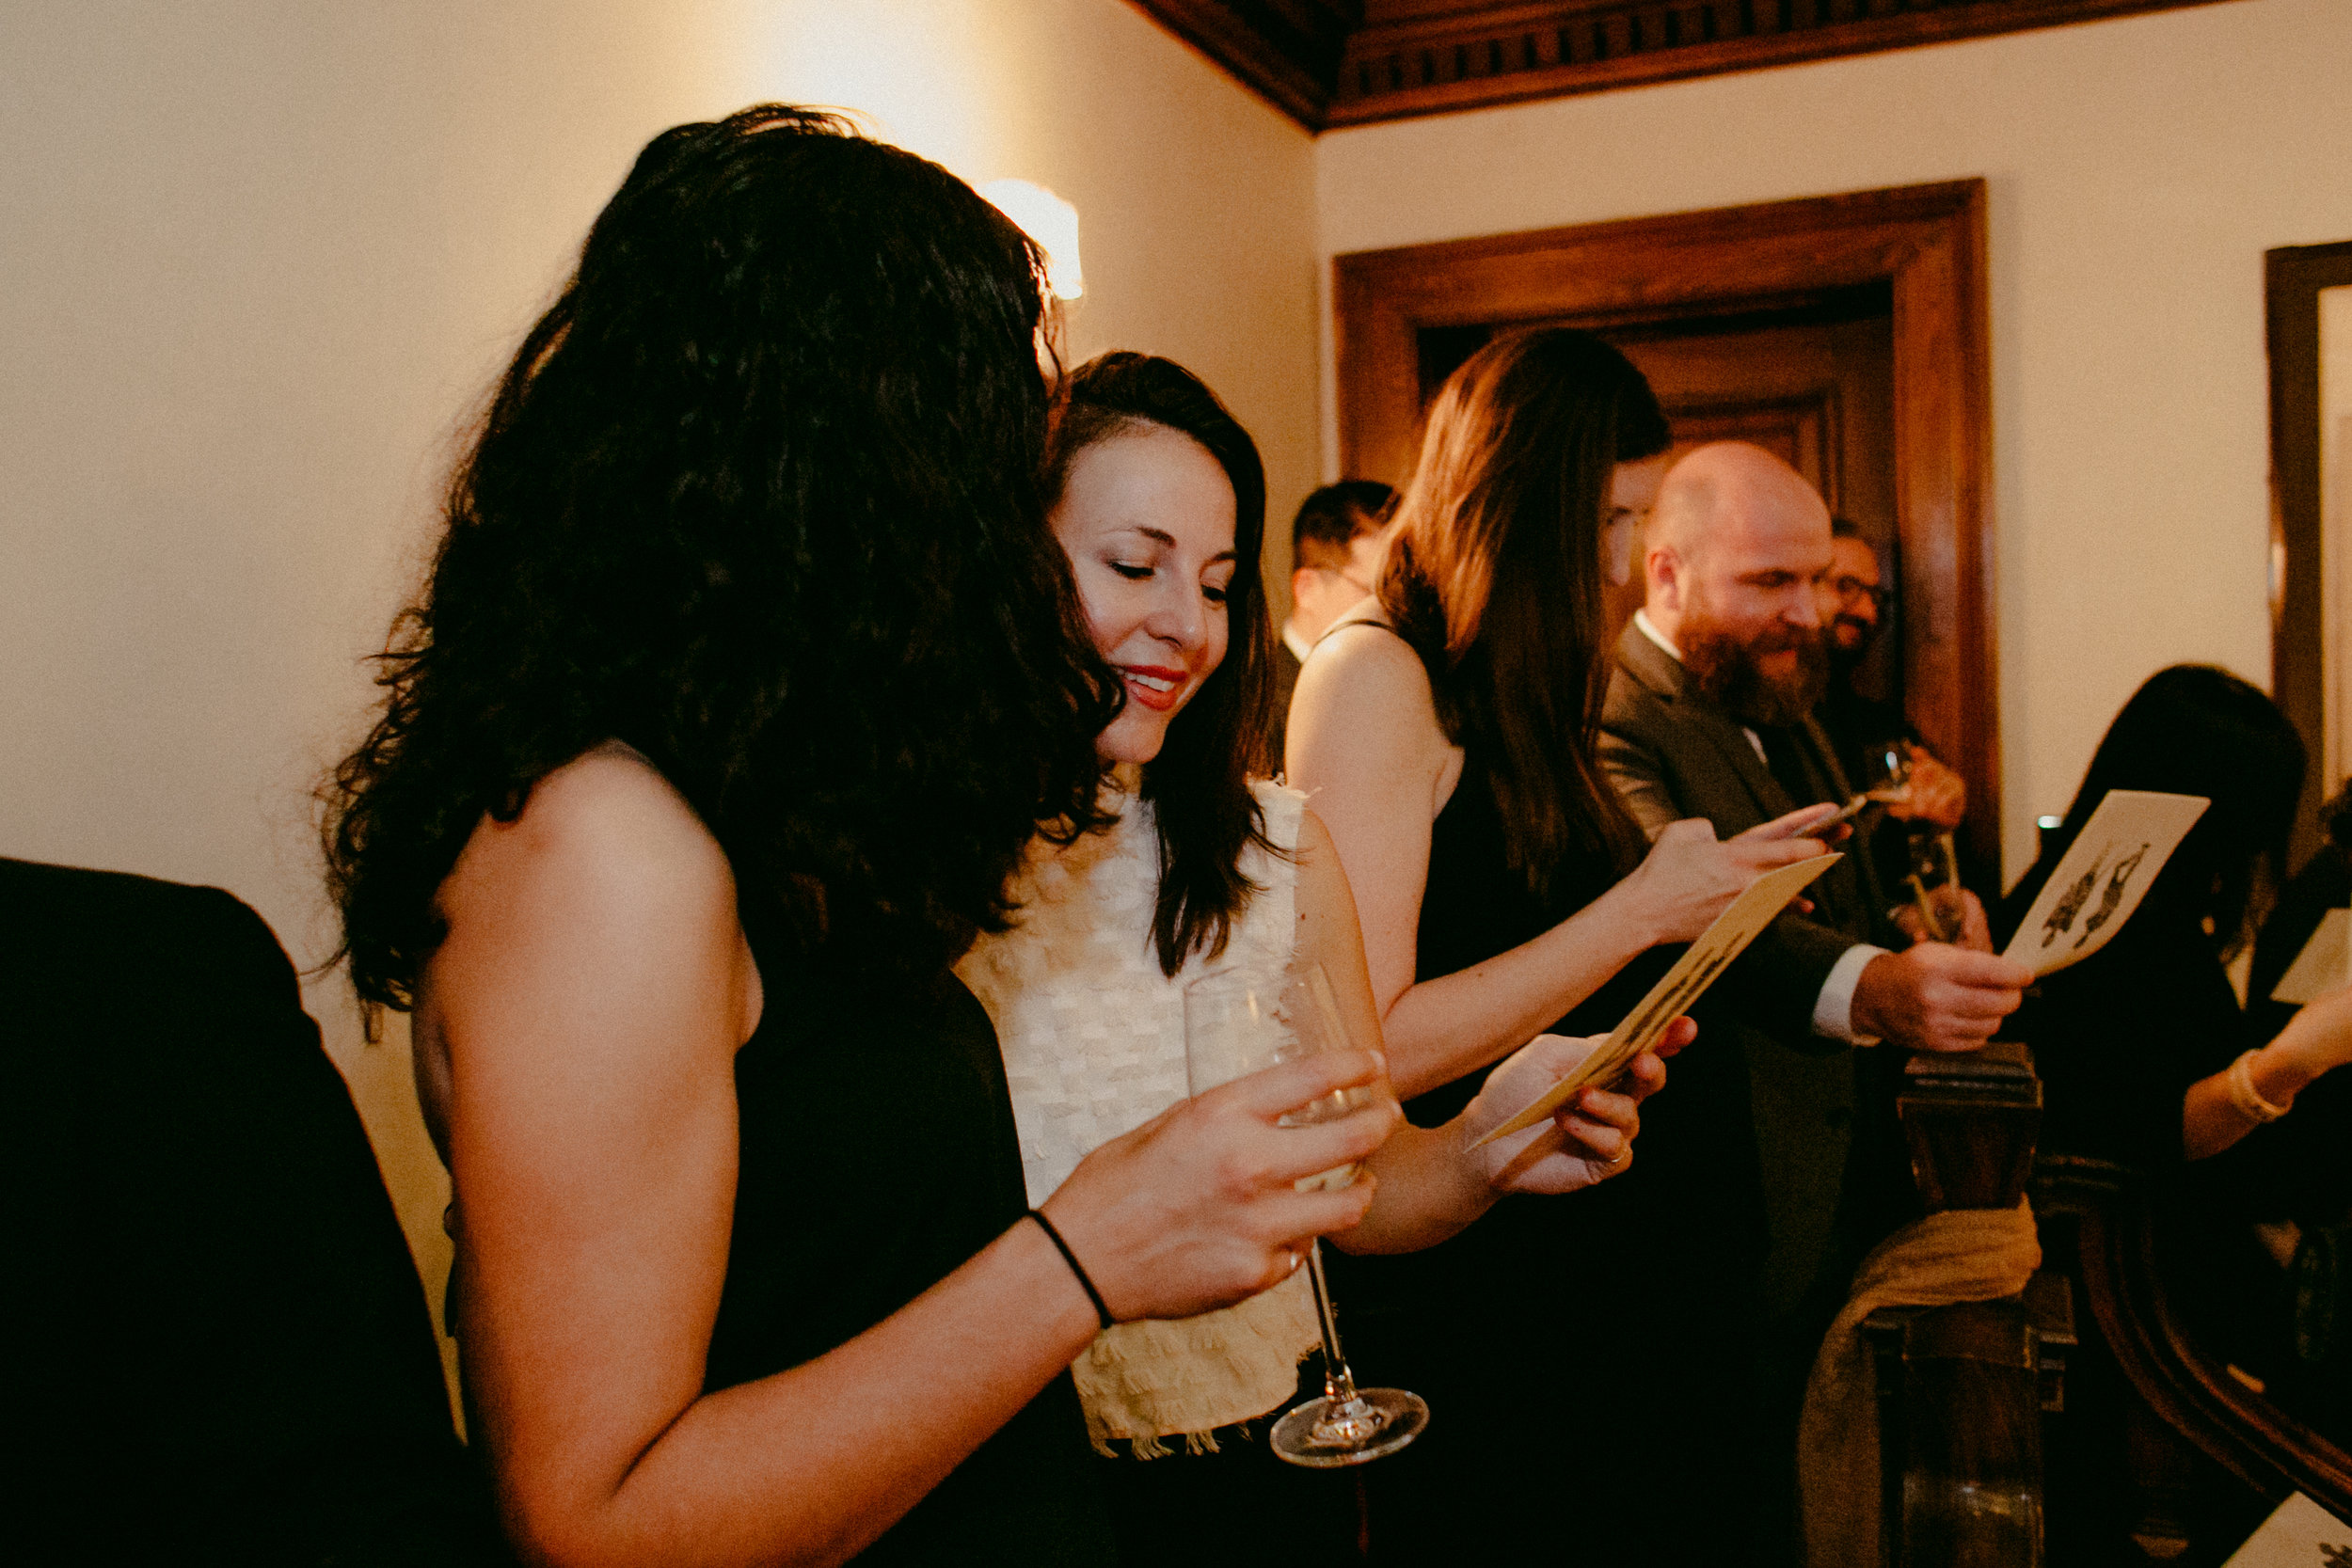 Tiger_House_The_Inn_at_Hudson-Wedding_Chellise_Michael_Photography-251.jpg